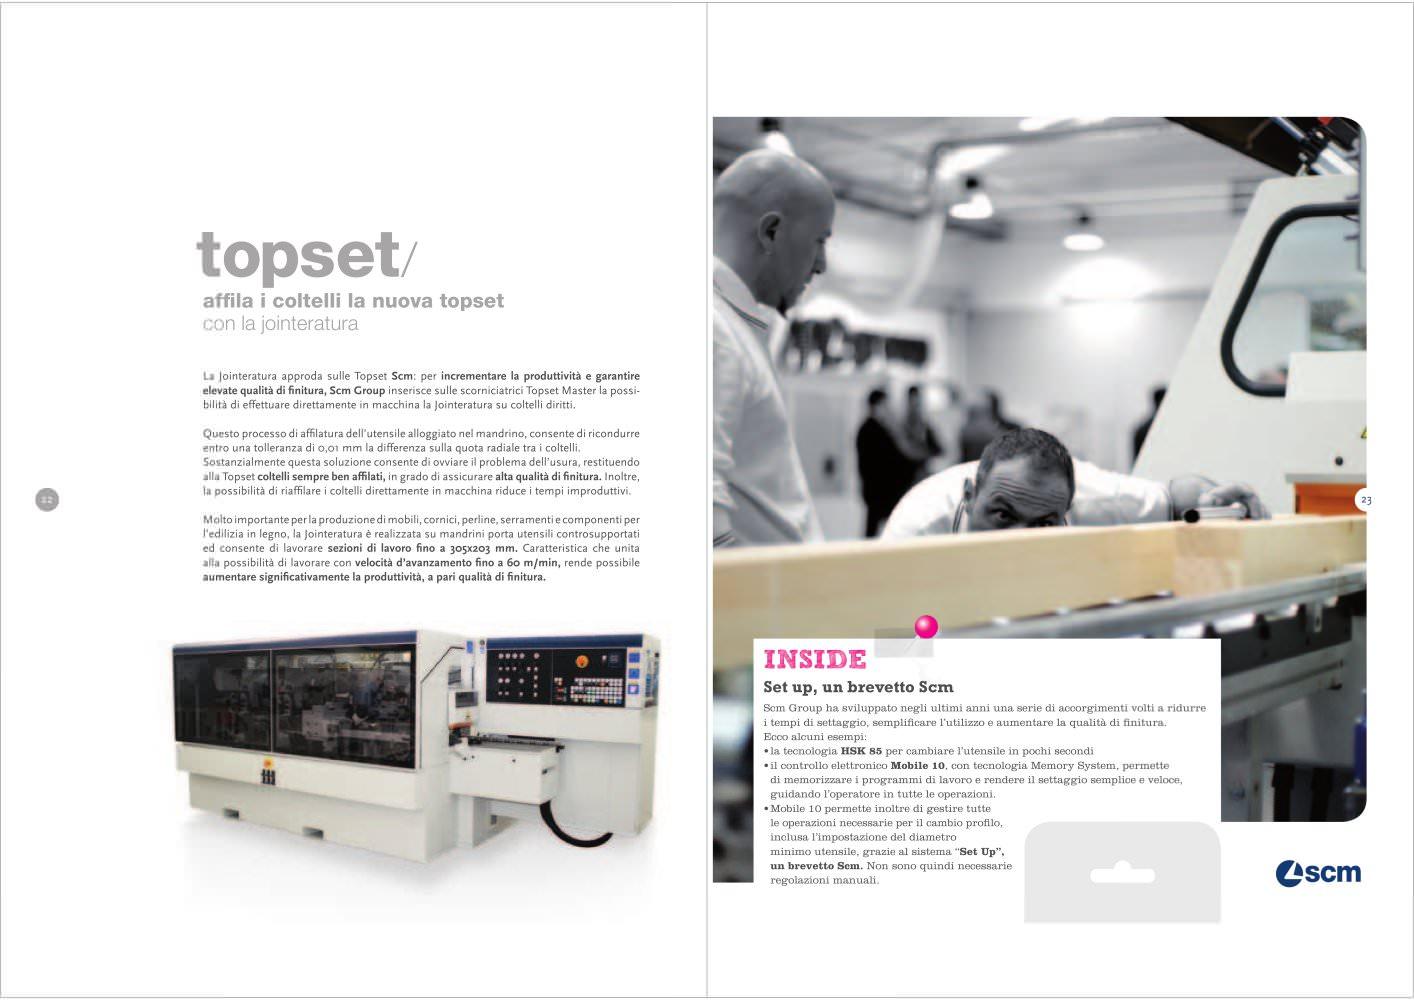 Lavorare Il Legno Pdf : Scm topset scm catalogue pdf documentation technique brochure